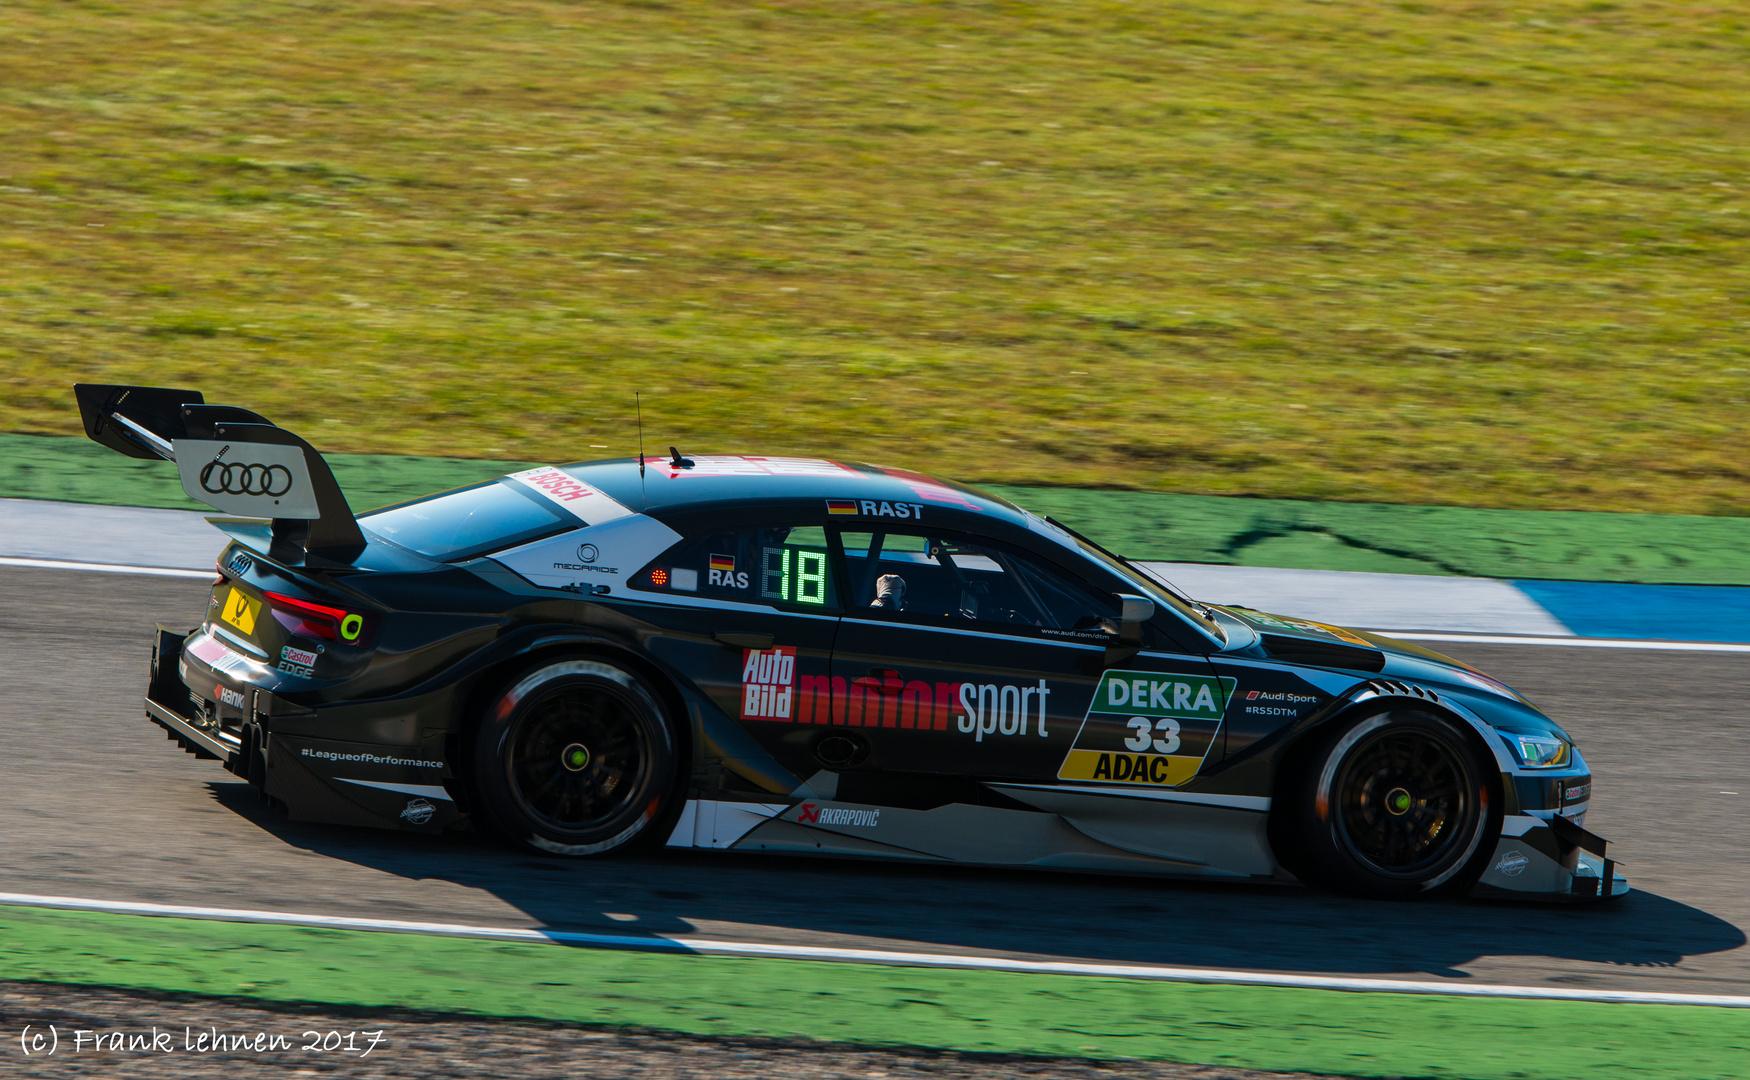 DTM Audi RS 5 - Rene Rast # 33